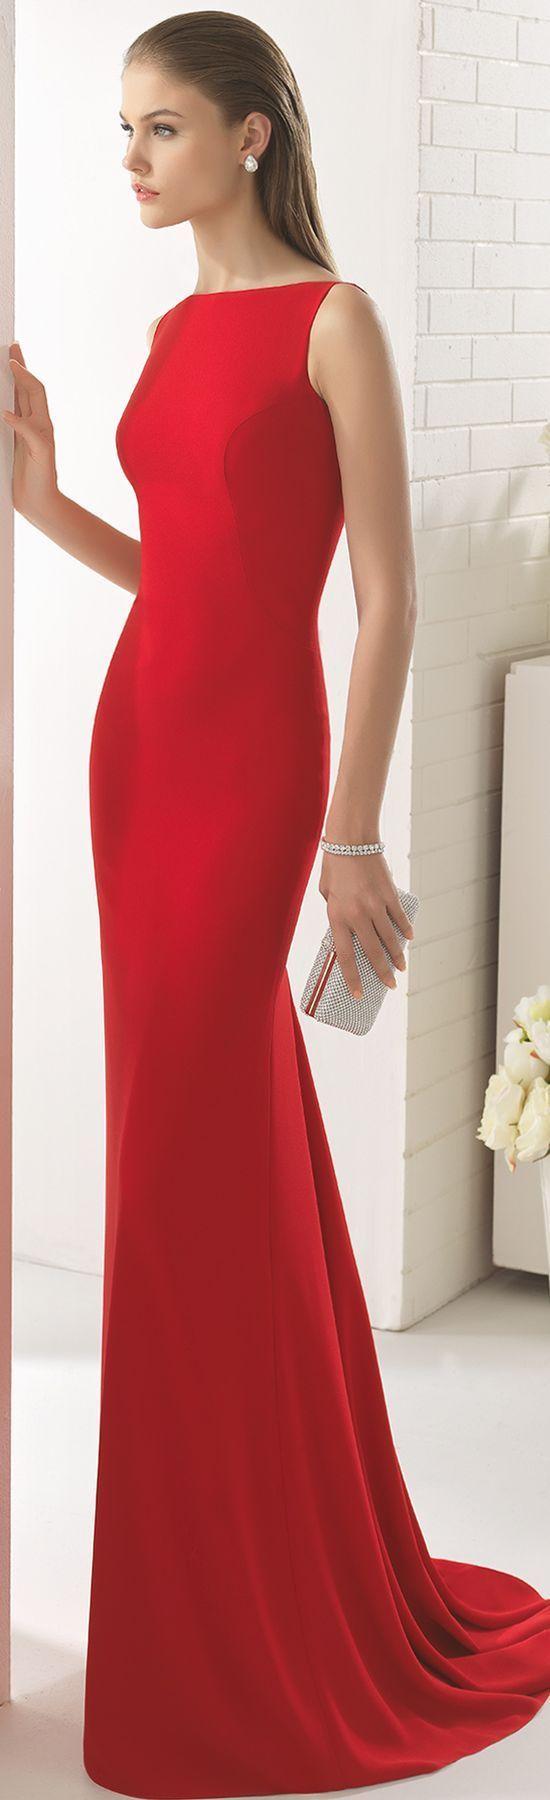 COLLECTION 2017 archivos - Aire Barcelona - Vestidos de novia o fiesta para estar perfecta #luxurydress